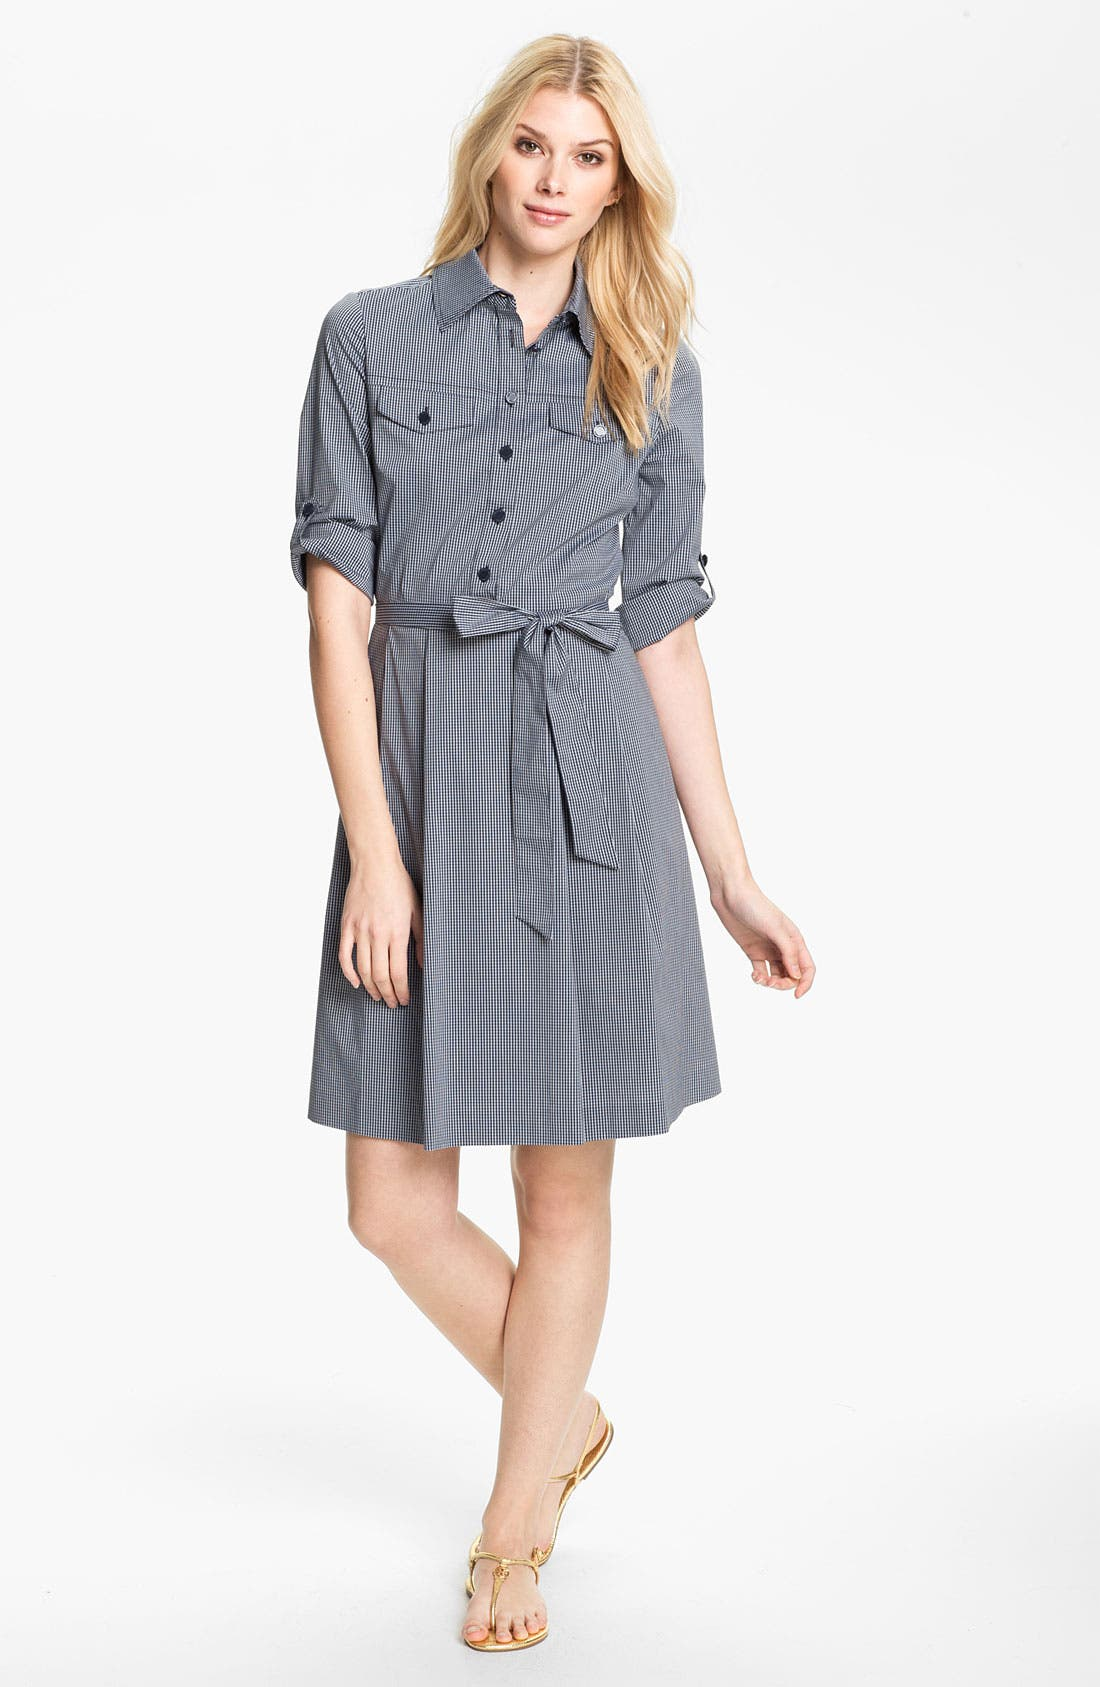 Main Image - Tory Burch 'Blythe' Stretch Poplin Shirtdress